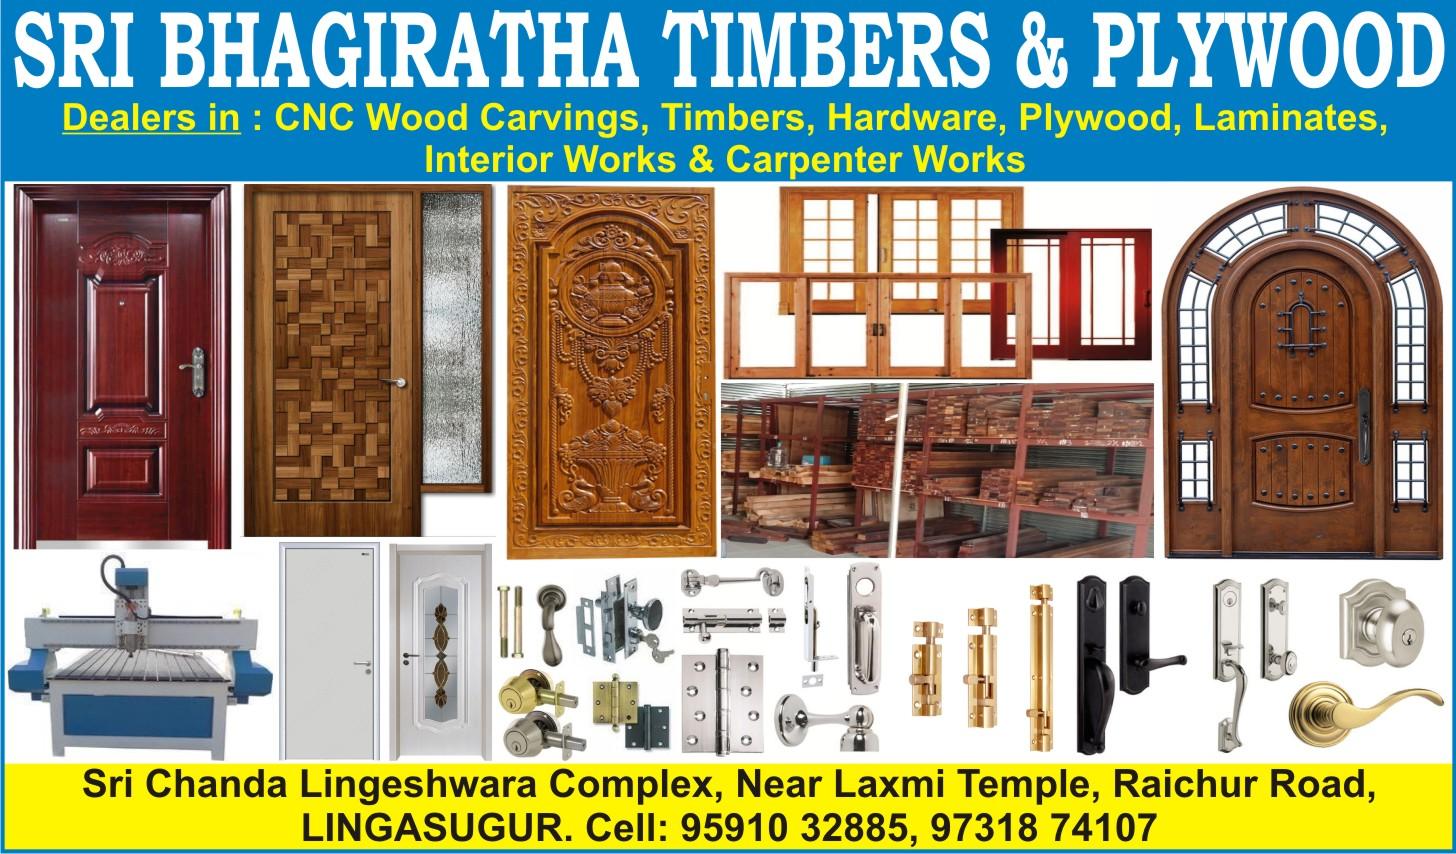 SRI BHAGIRATHA TIMBERS & PLYWOOD